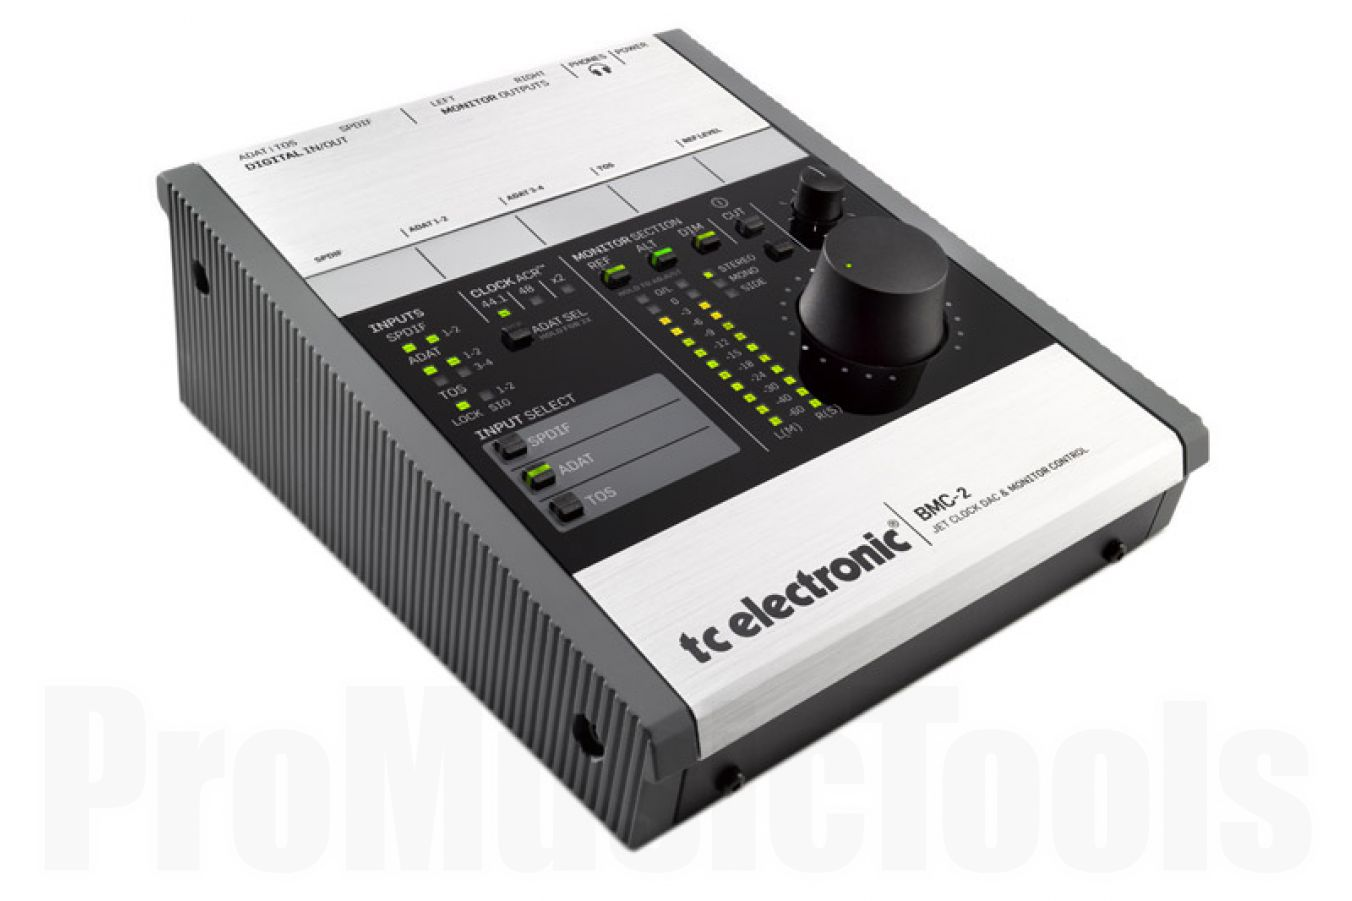 TC Electronic BMC-2 - b-stock (1x opened box)